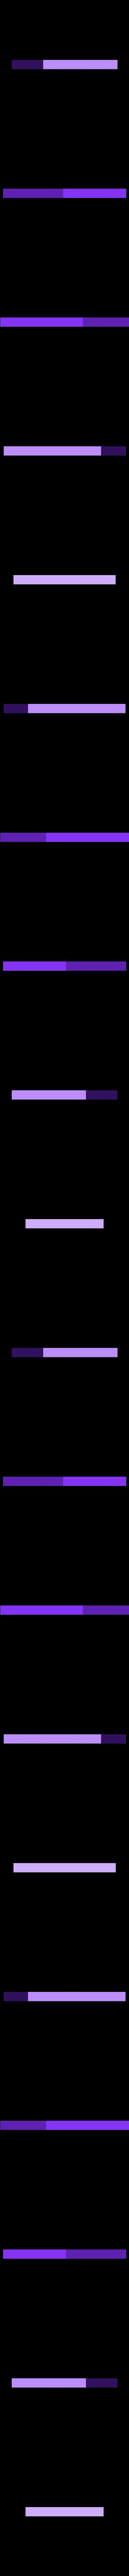 Clasp_3.stl Download free STL file Jacket Buckle-Clasp • 3D printable design, rabotilnicata